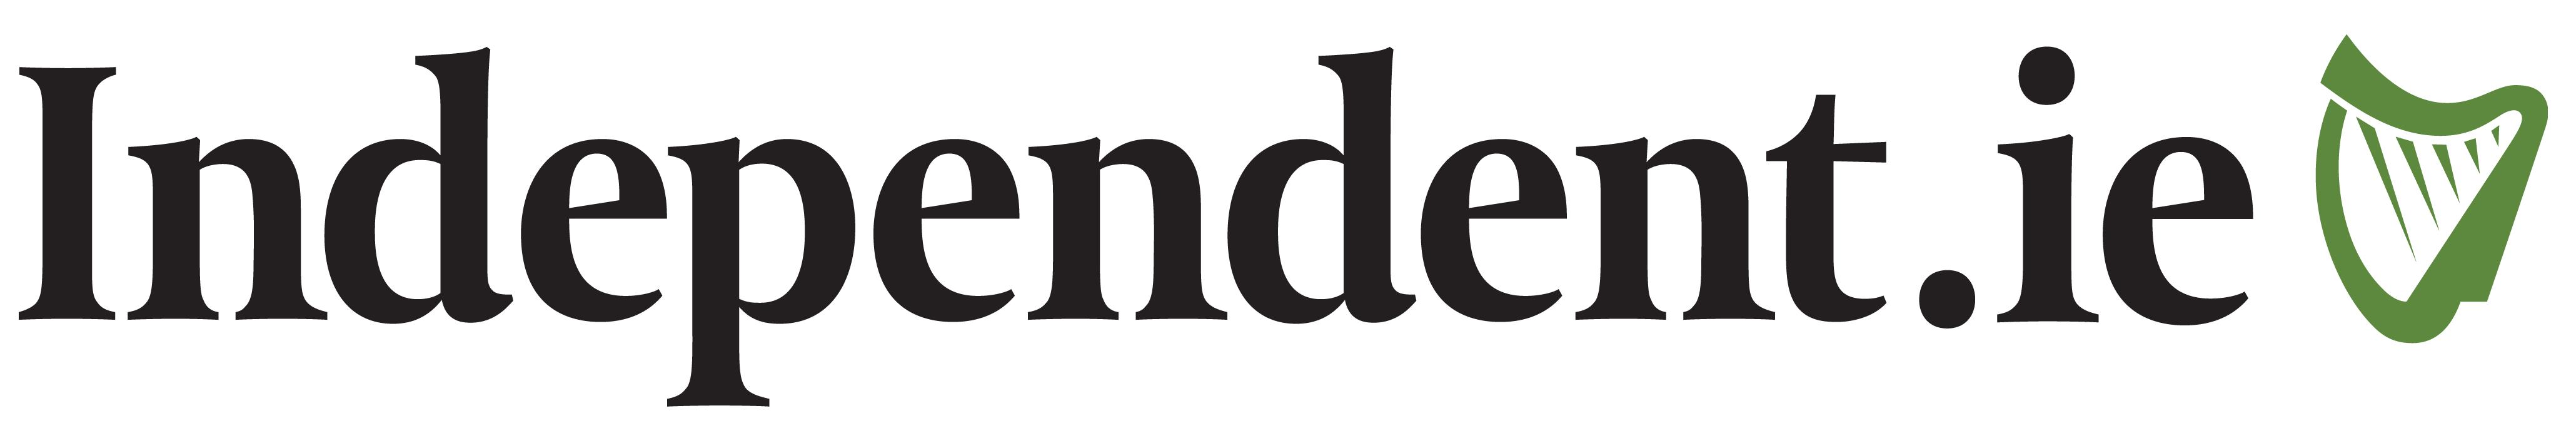 Irish_Independent_logo